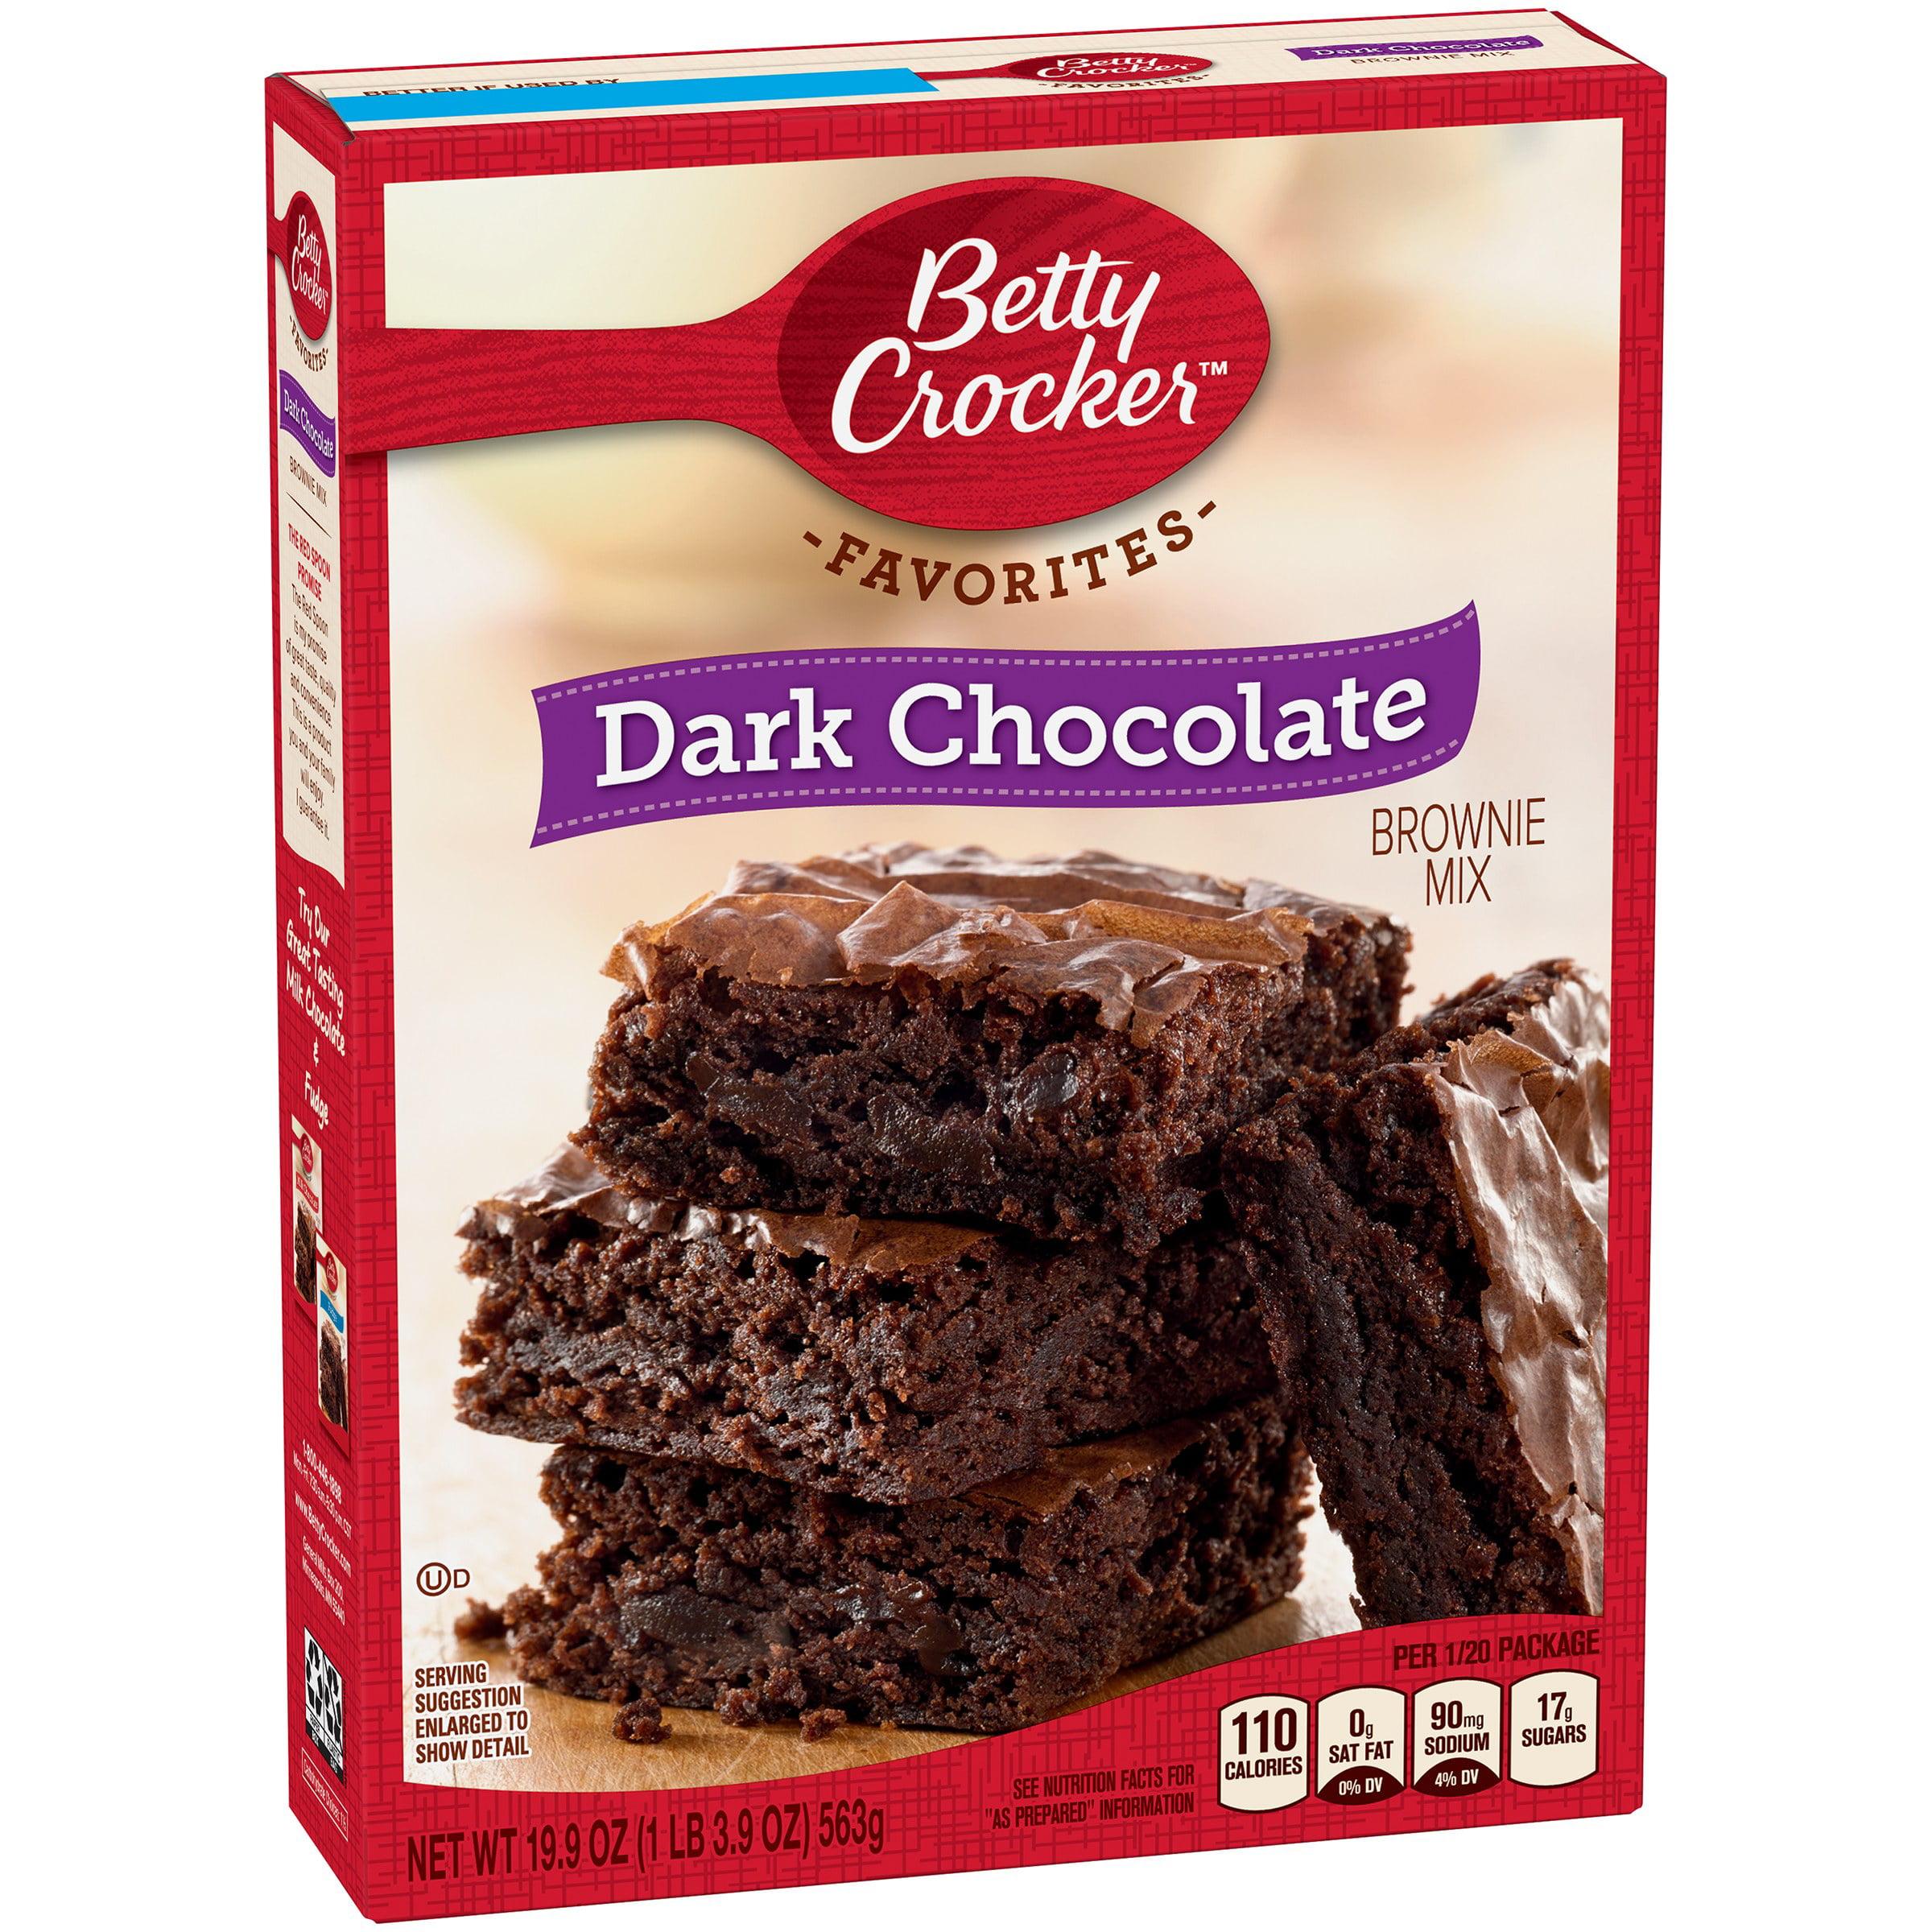 Betty Crocker Dark Chocolate Brownie Mix, 19.9 oz by General Mills Sales, Inc.